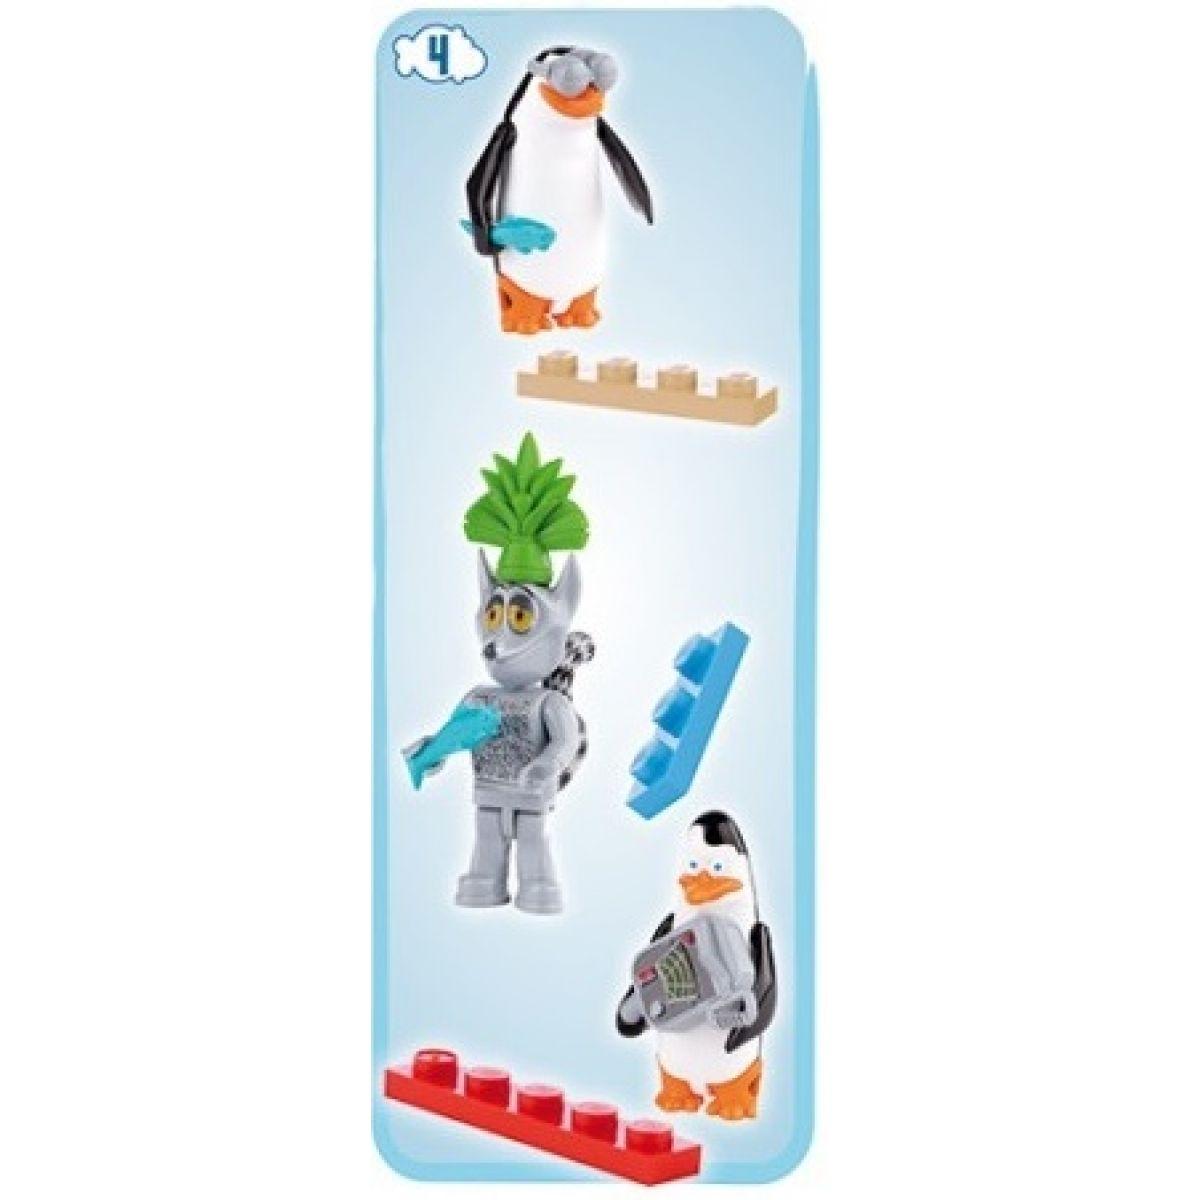 Cobi 26003 Tučňáci z Madagaskaru Tři figurky v blistru - Tučňáci a Jelimán